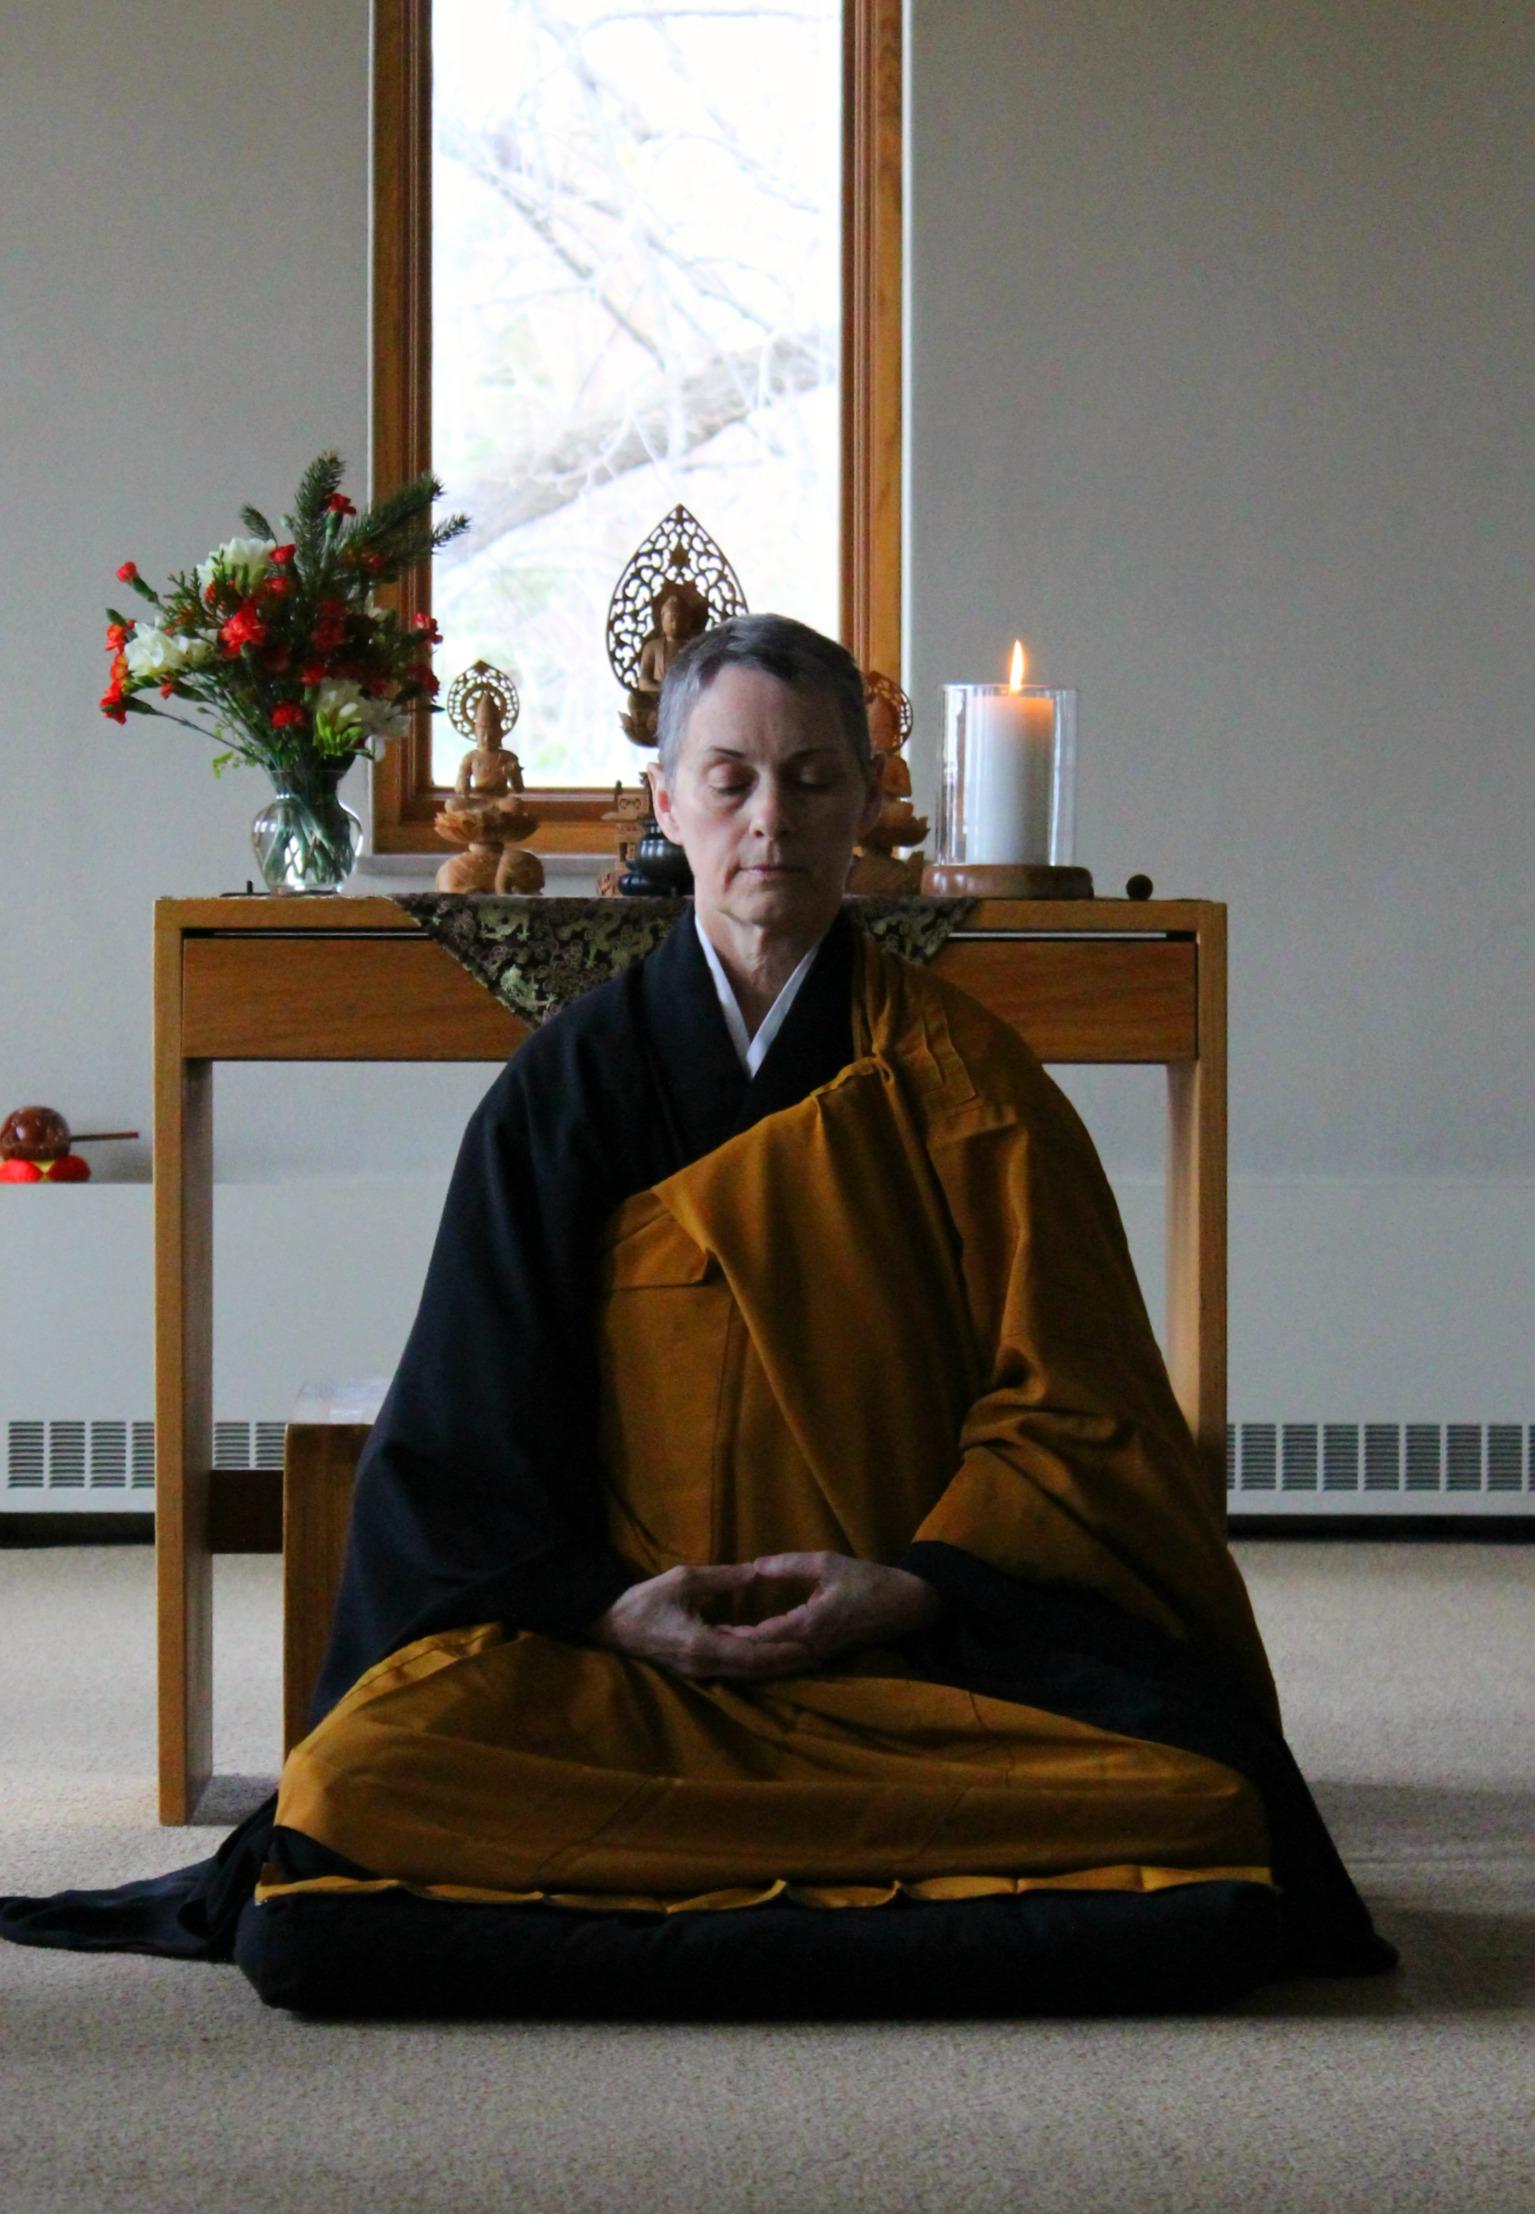 My beautiful friend and meditation teacher,  Karen Maezen Miller